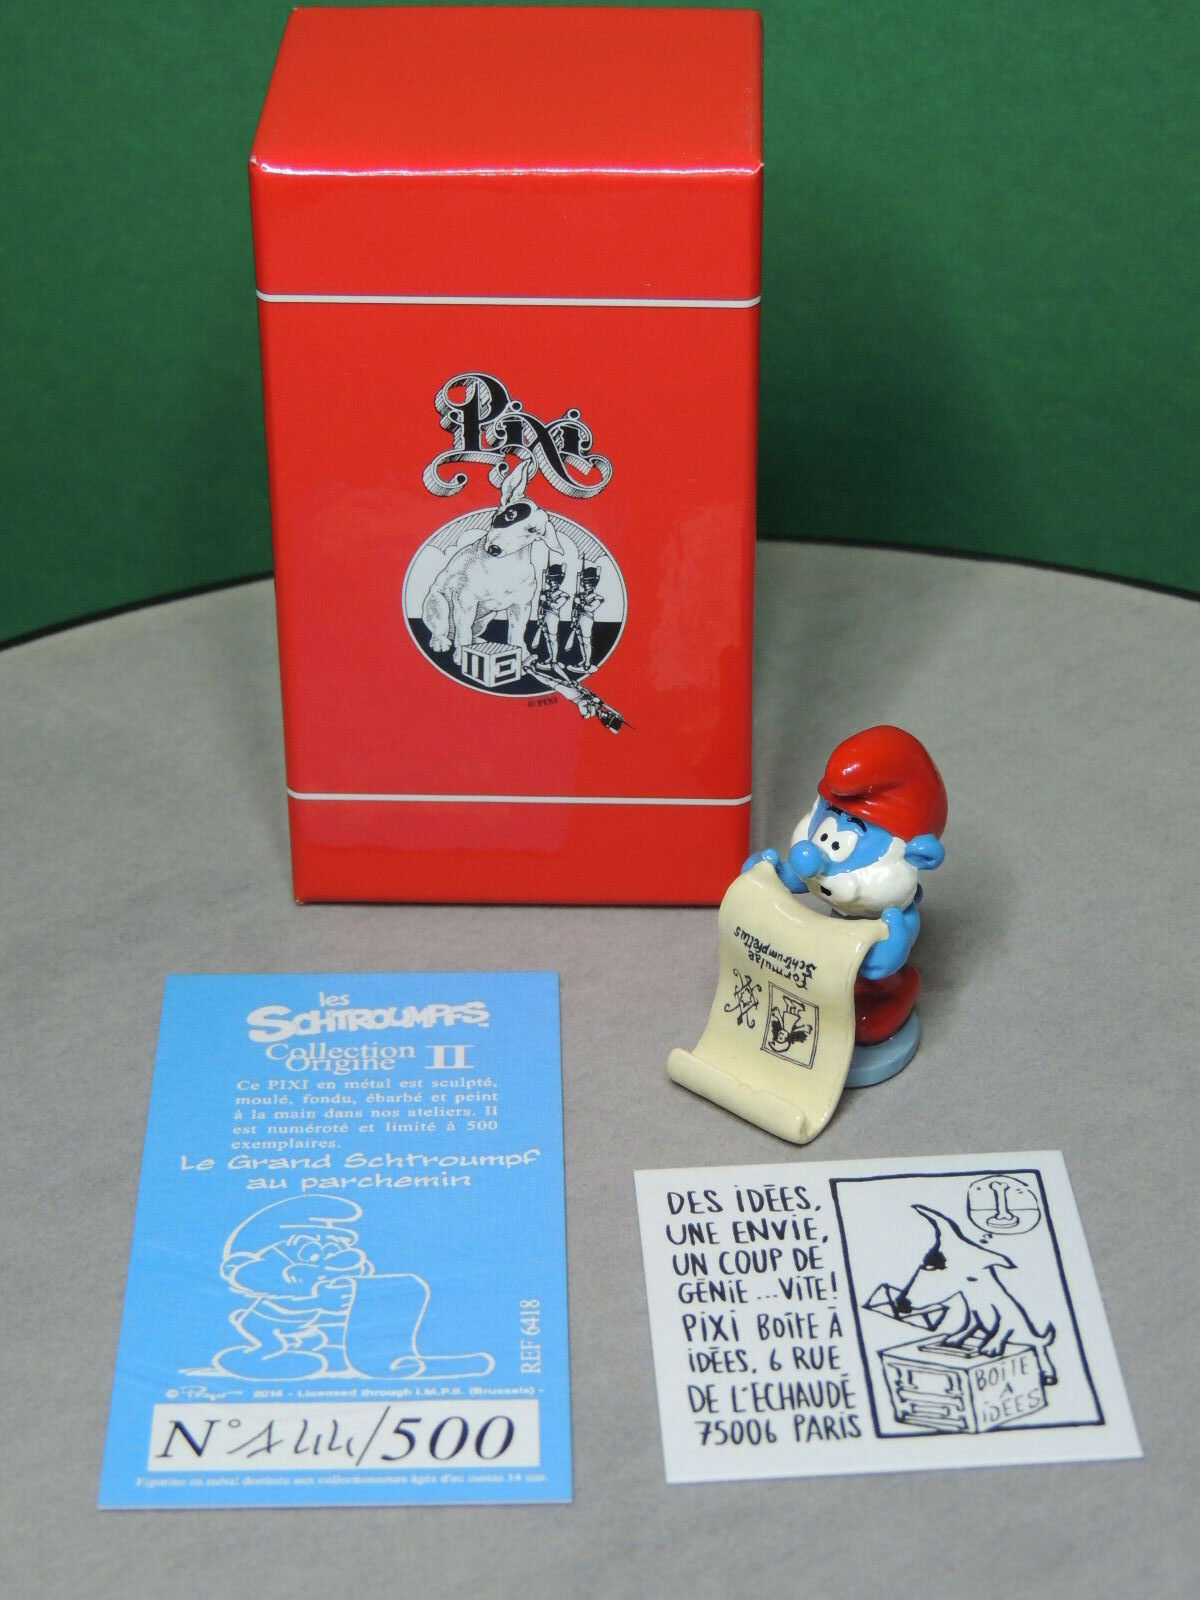 6418 Grand Schtroumpf au parchemin - PIXI Figurine Collection Origine serie II